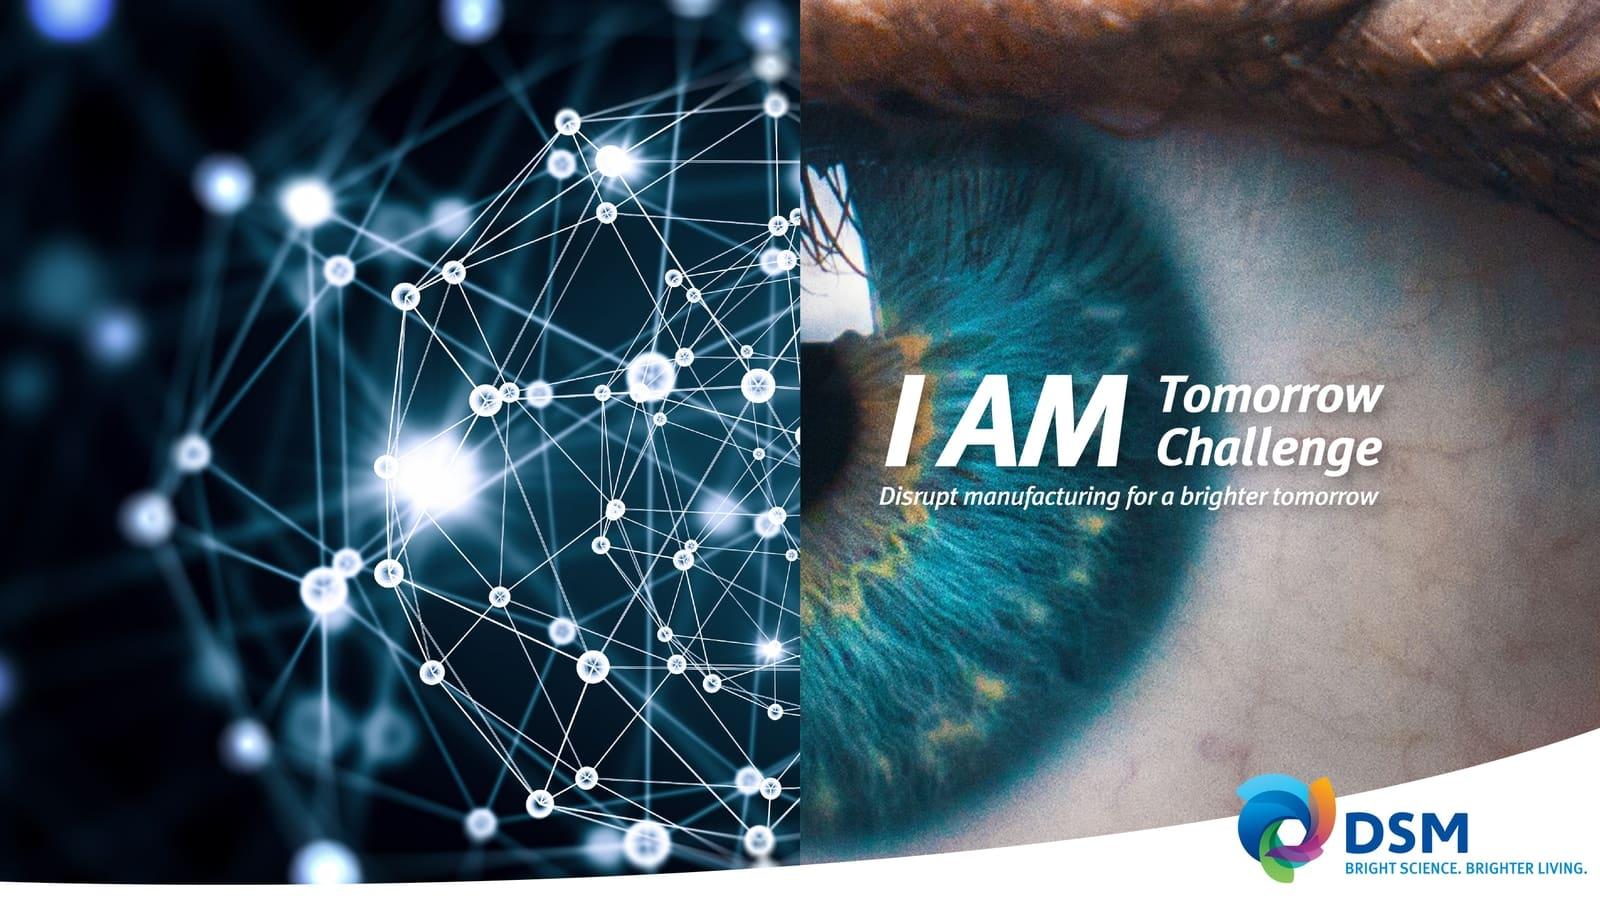 I AM Tomorrow Challenge from DSM. Image via DSM.